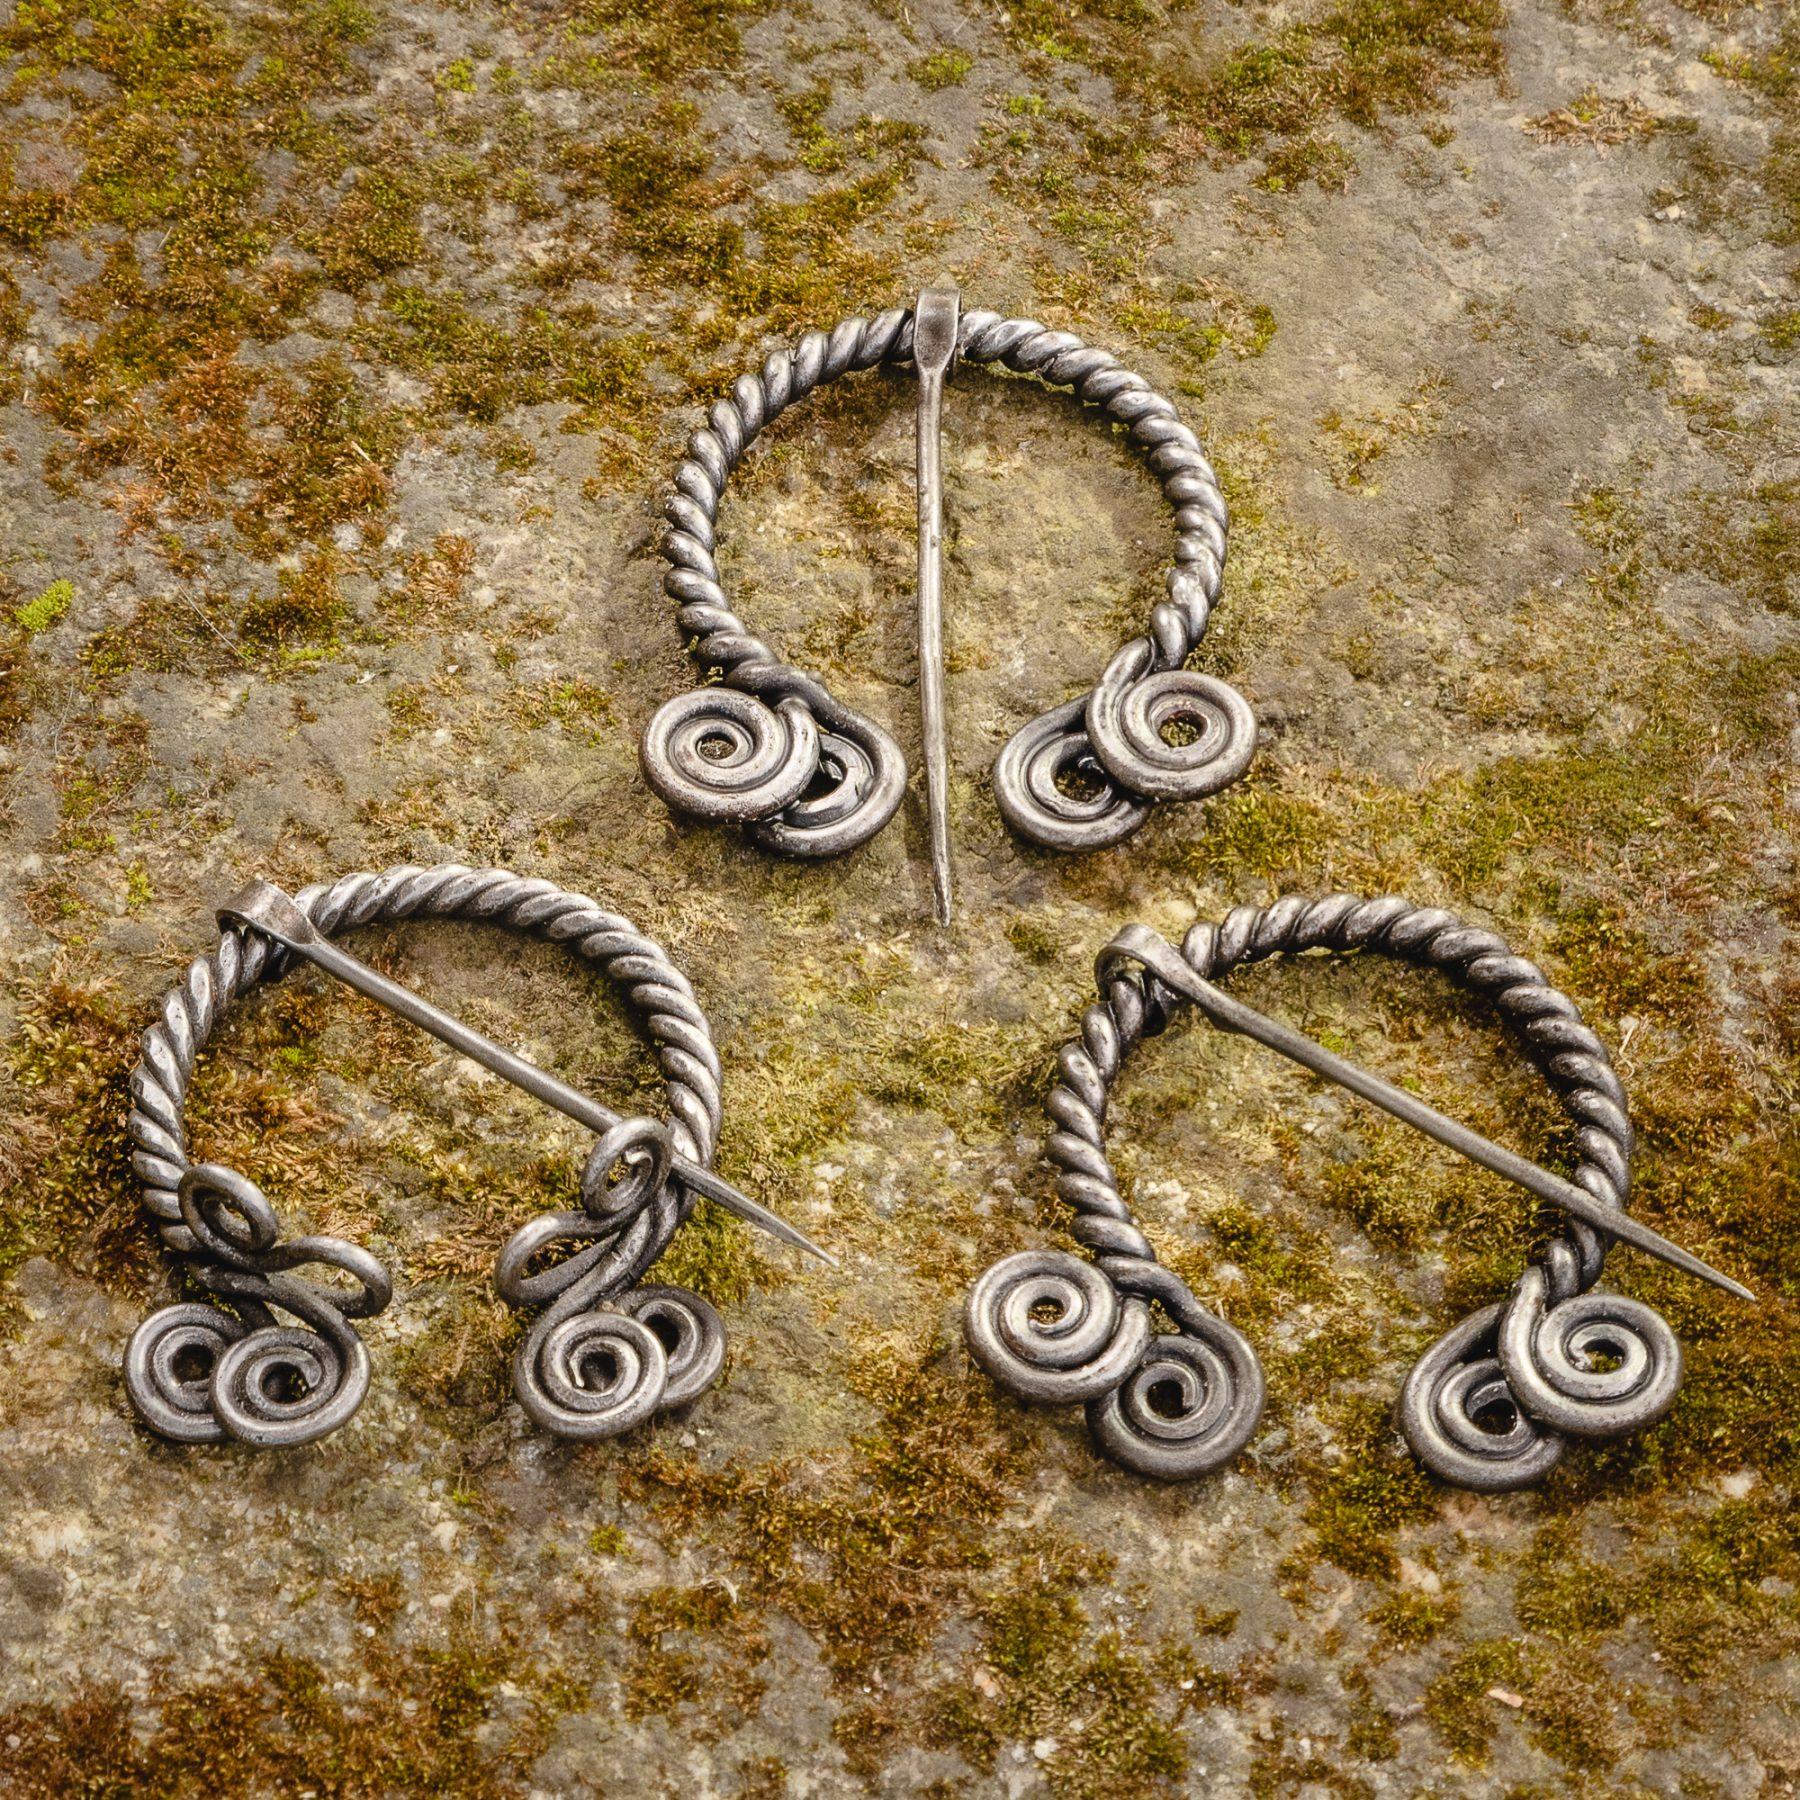 Twisted Metal Cloak Pin (var 2)